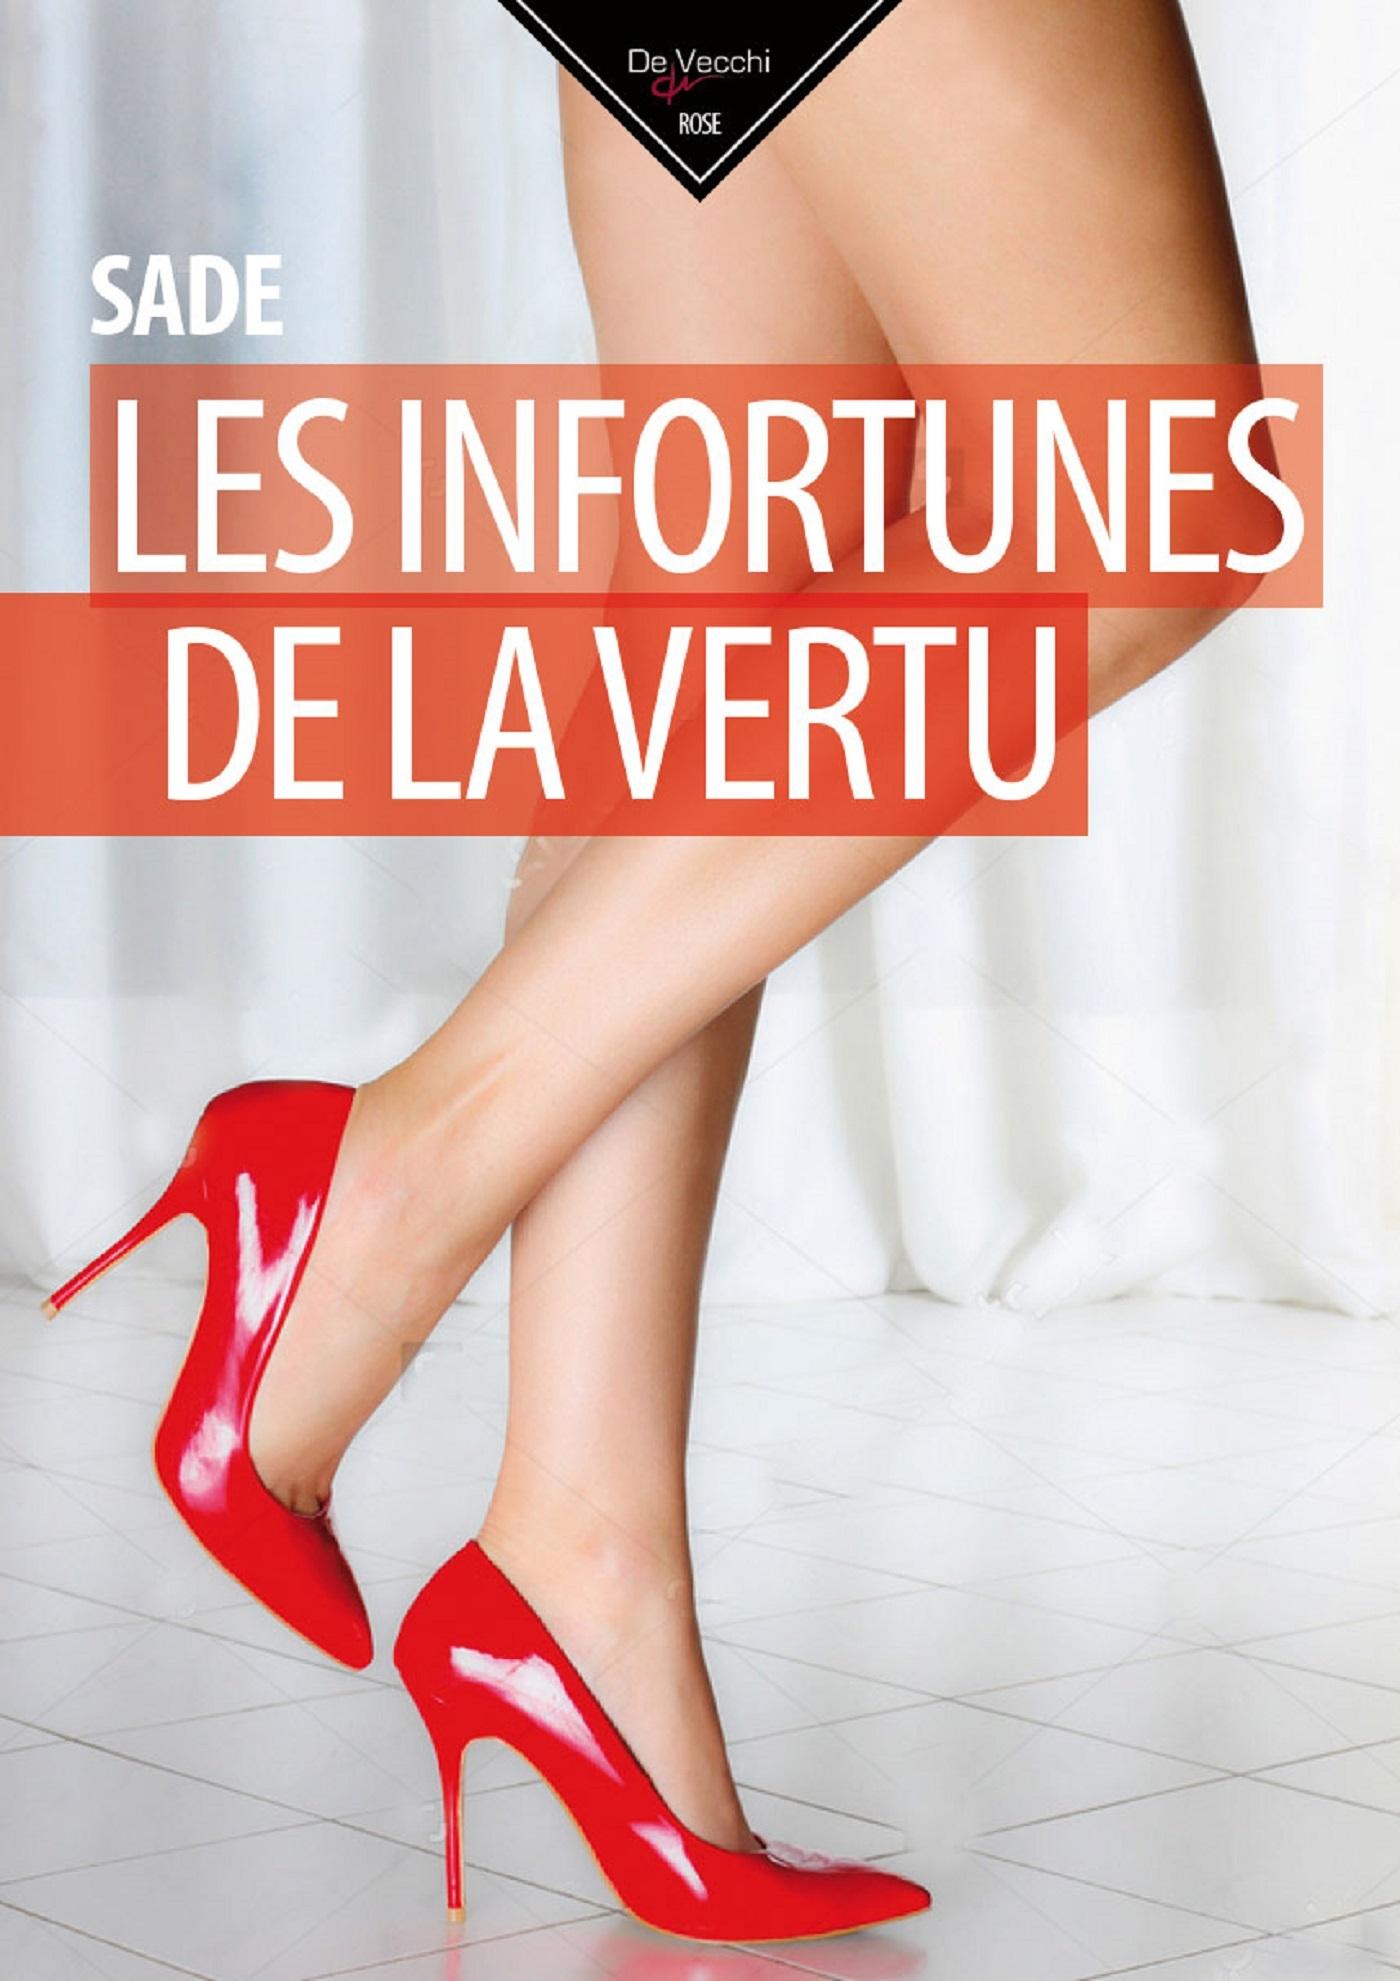 INFORTUNES DE LA VERTU (LES)